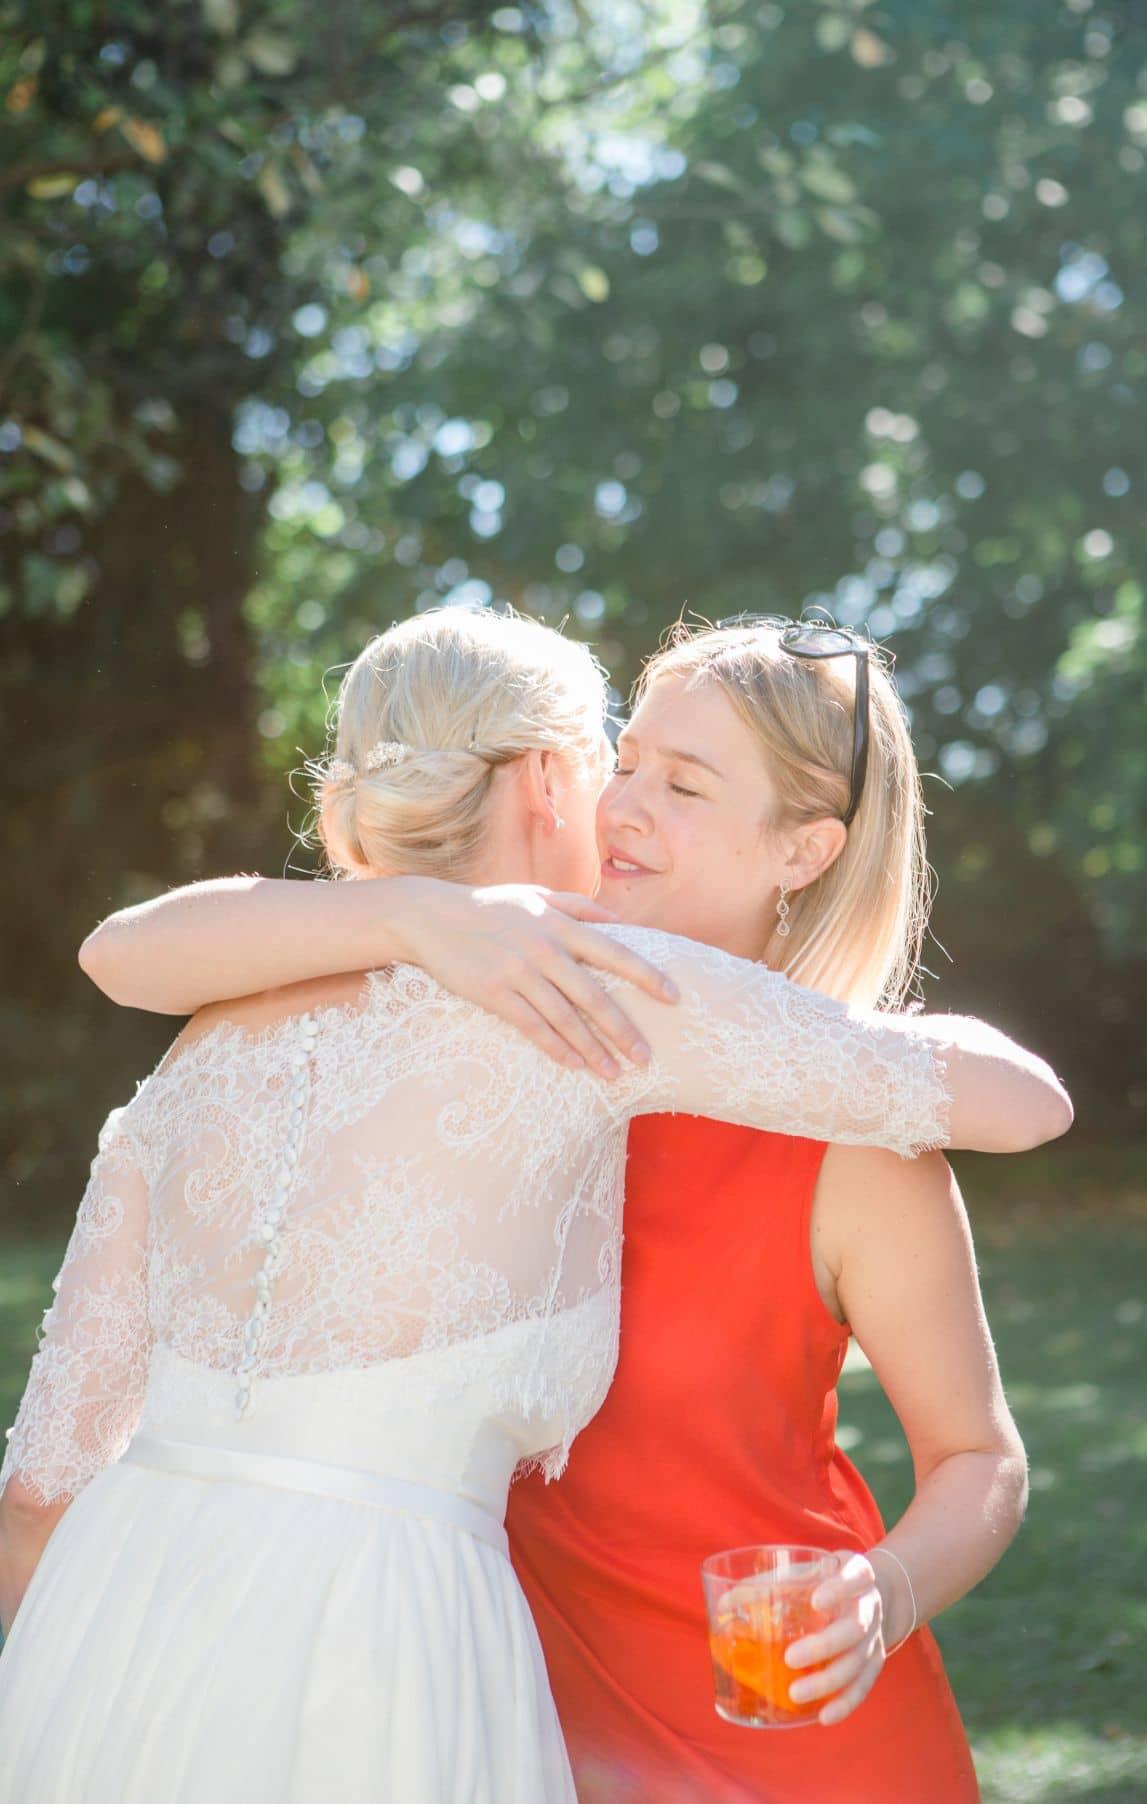 Million Memories_A&D_Hochzeitsfotograf_Schlosshochzeit_Toskana_Lago Di Como_Wedding_Tuscany_120